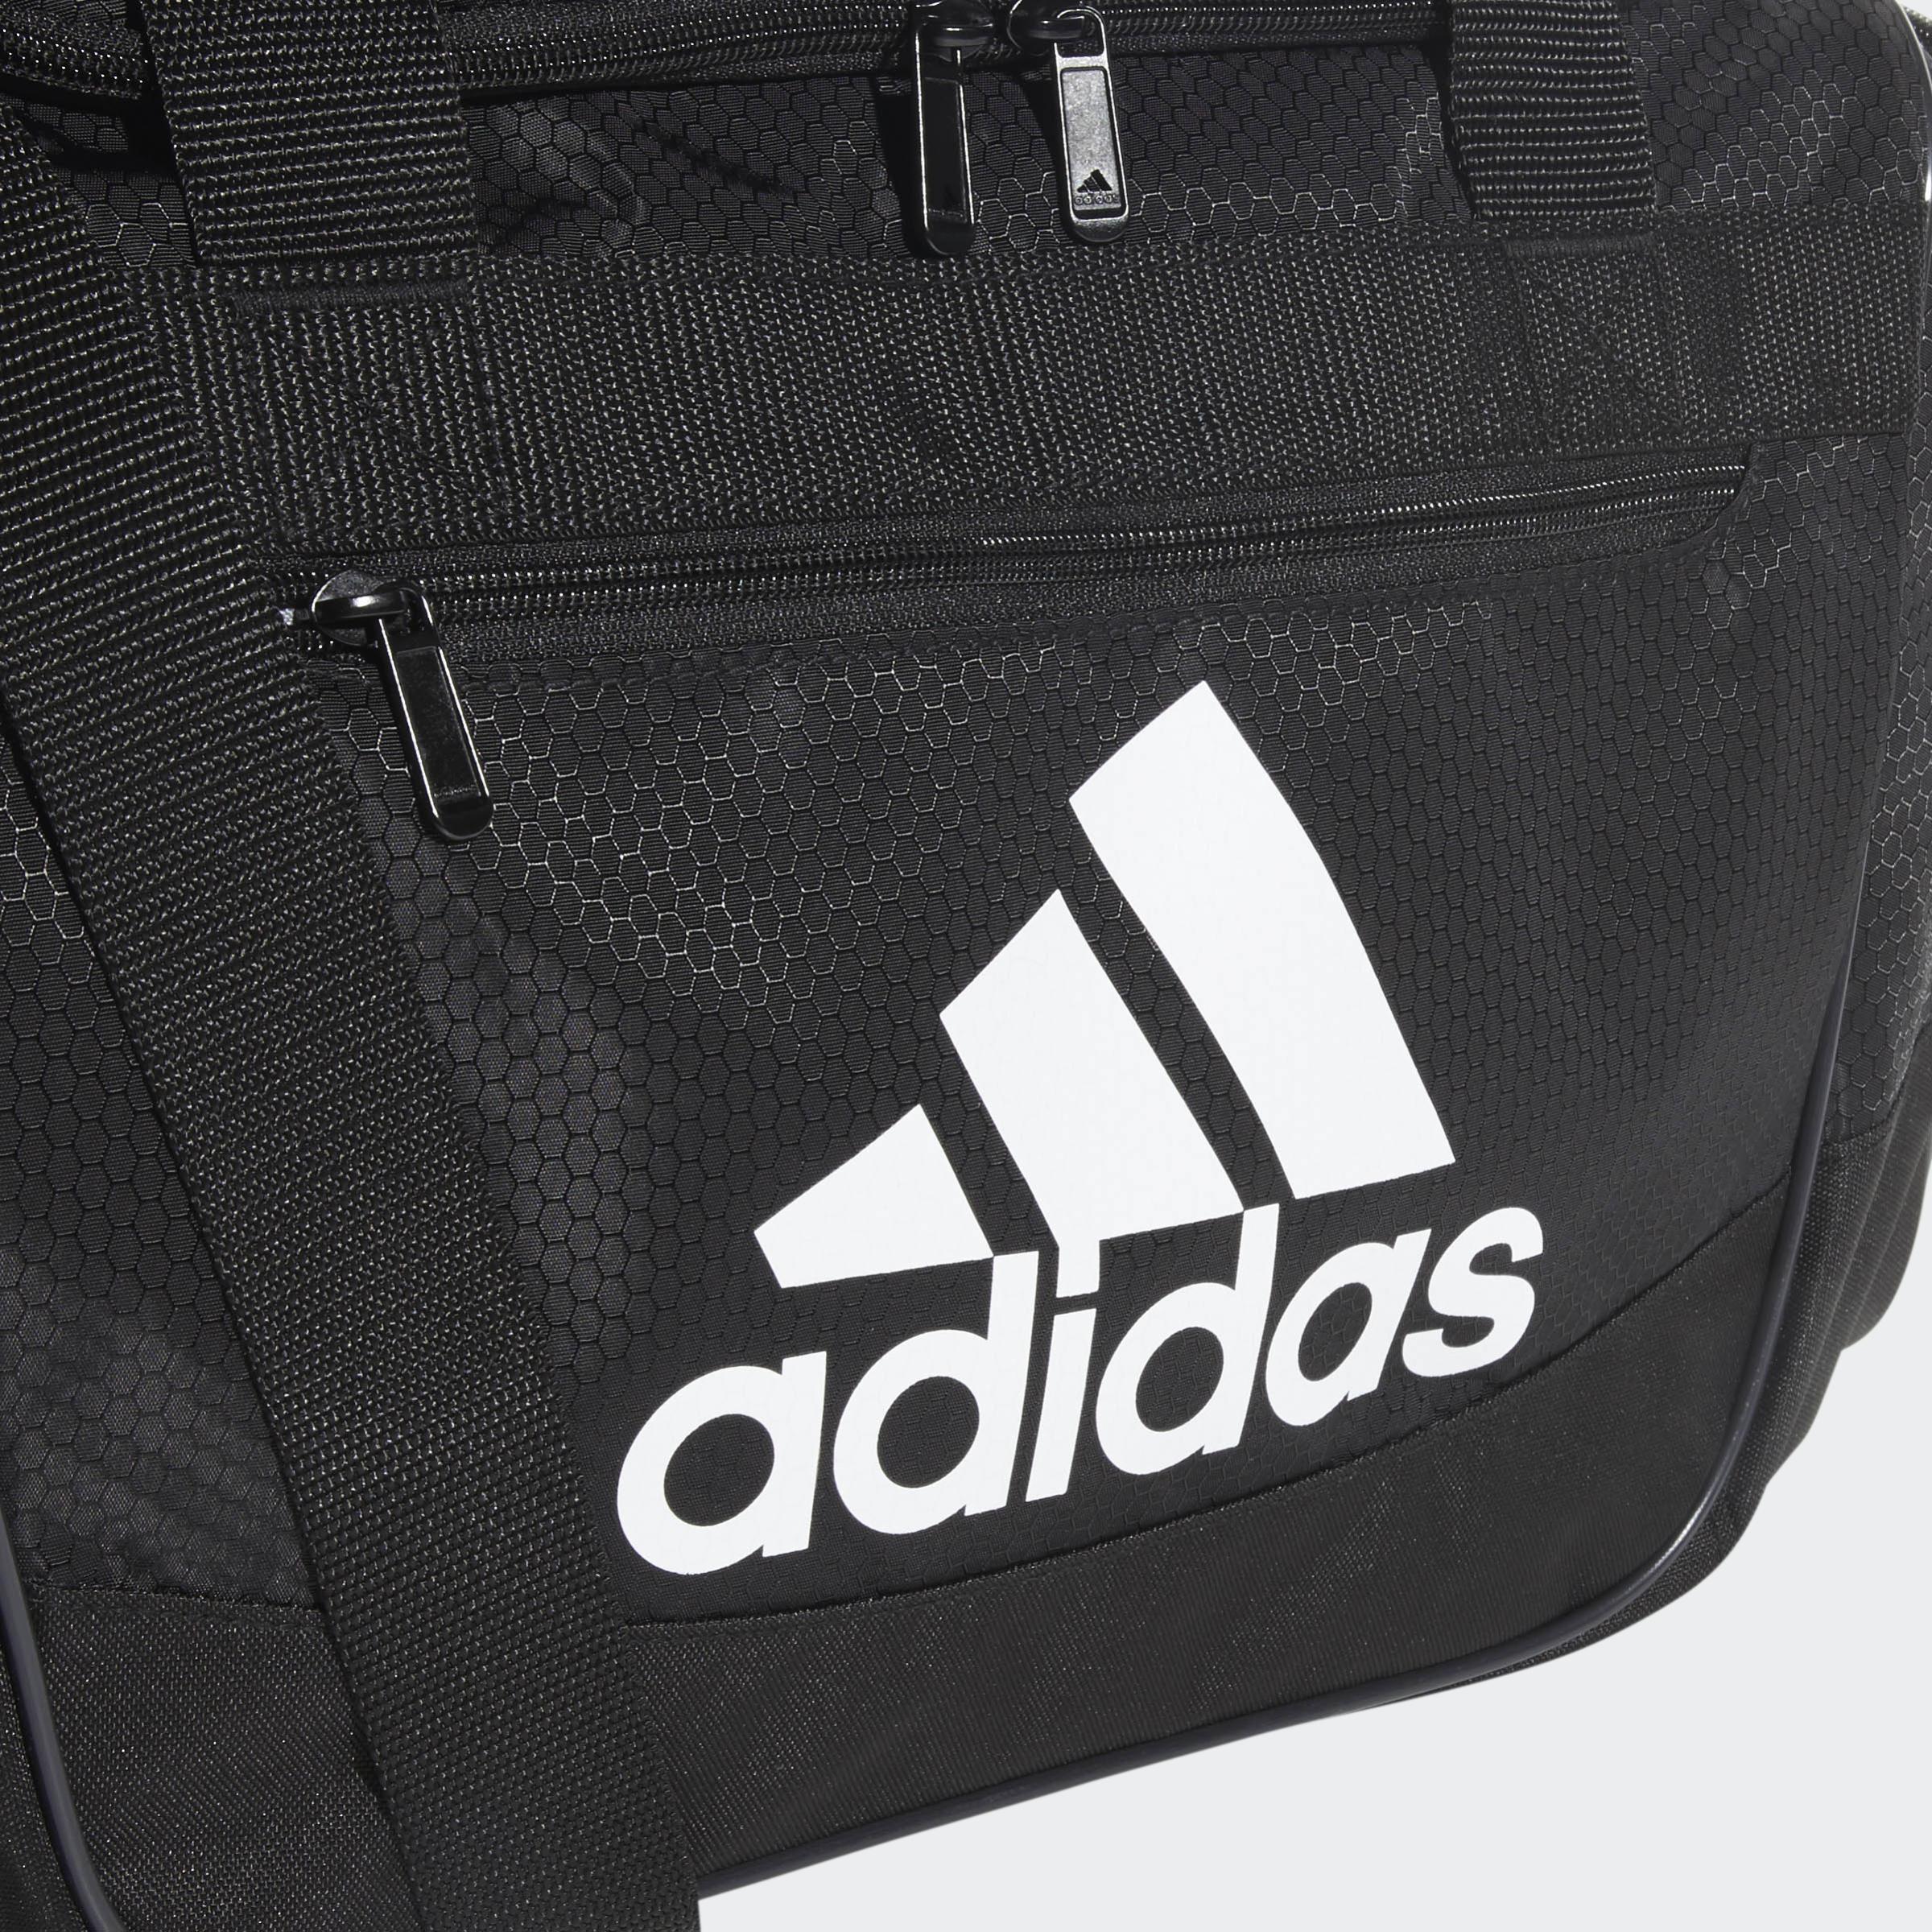 miniature 7 - adidas Defender III Small Duffel  Bags